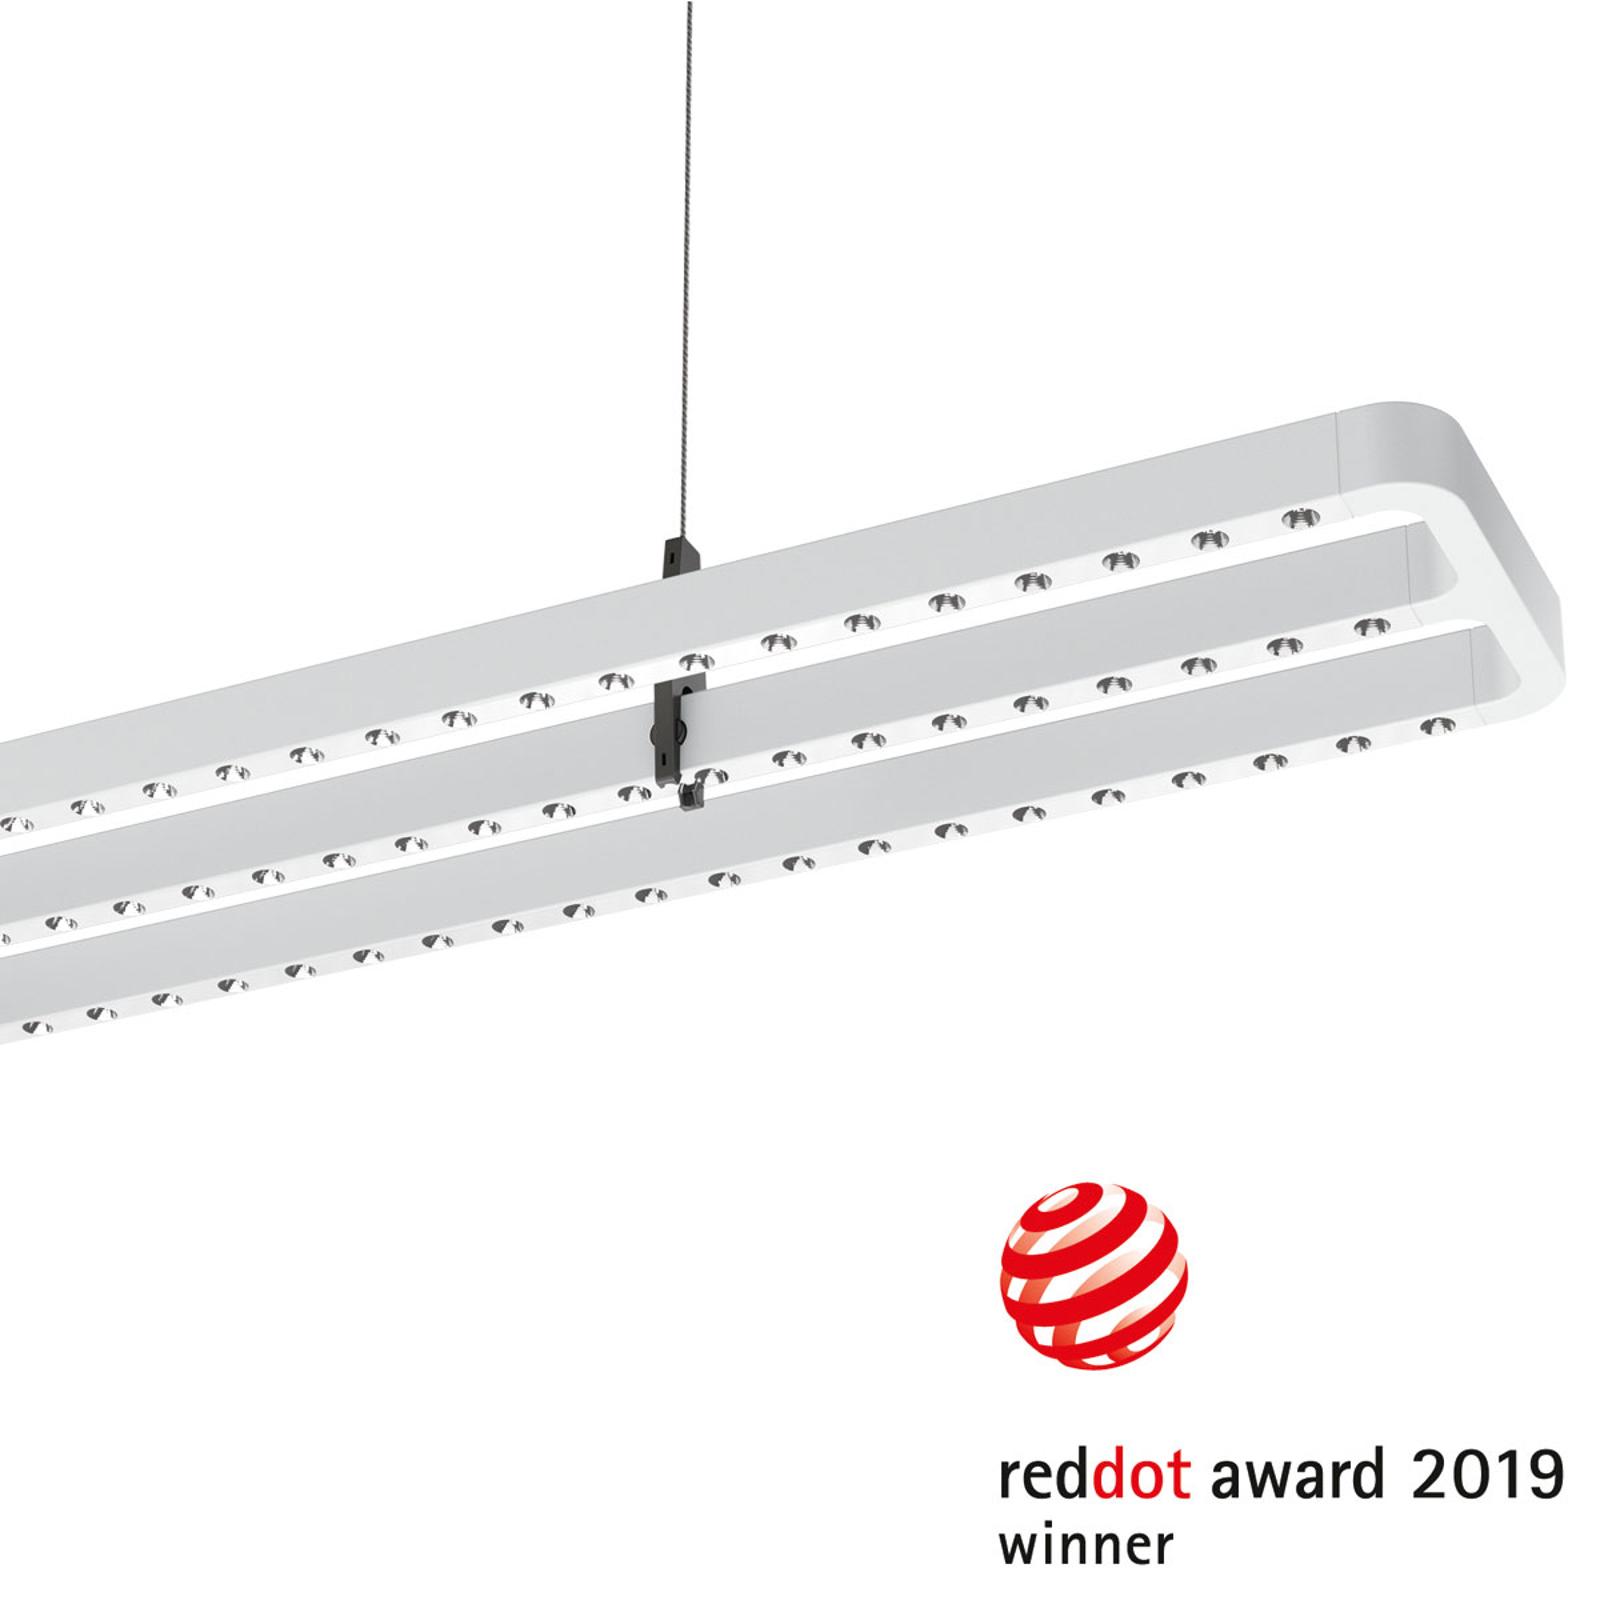 LED-riippuvalaisin Small Line tunnistin 126 cm